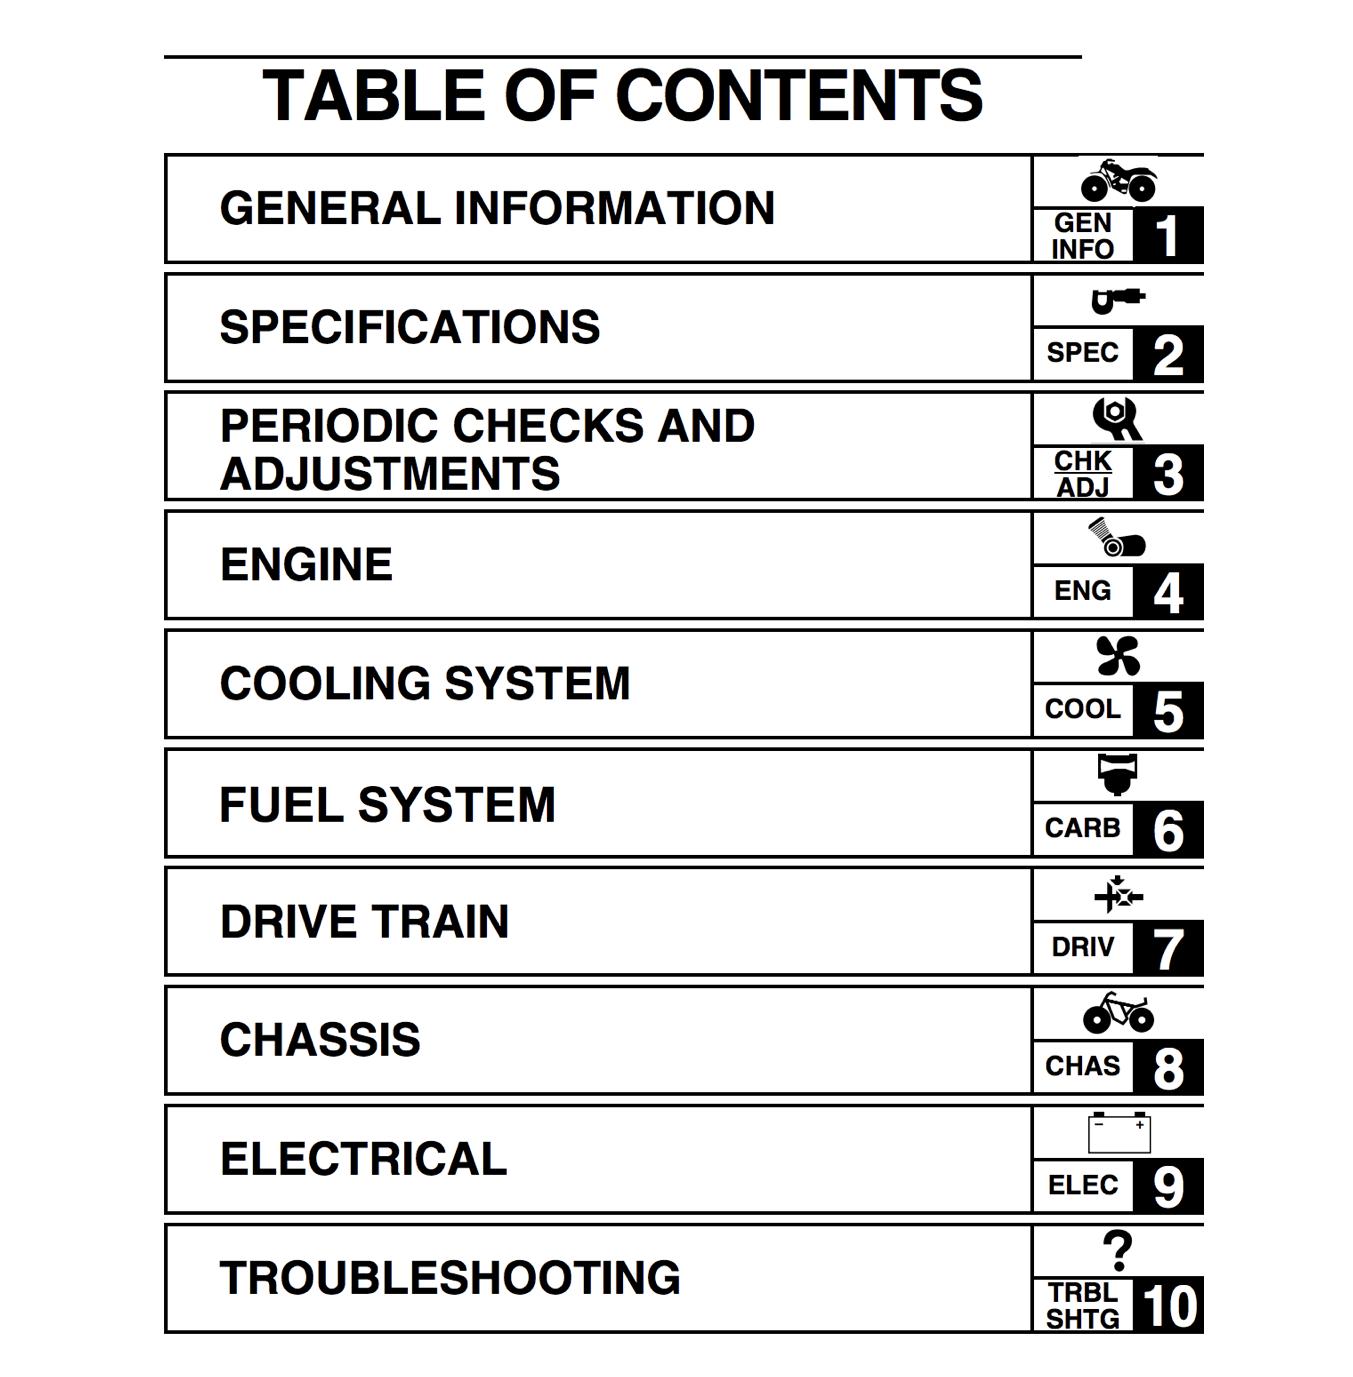 Polaris Sportsman 500 Service Manual Chapters